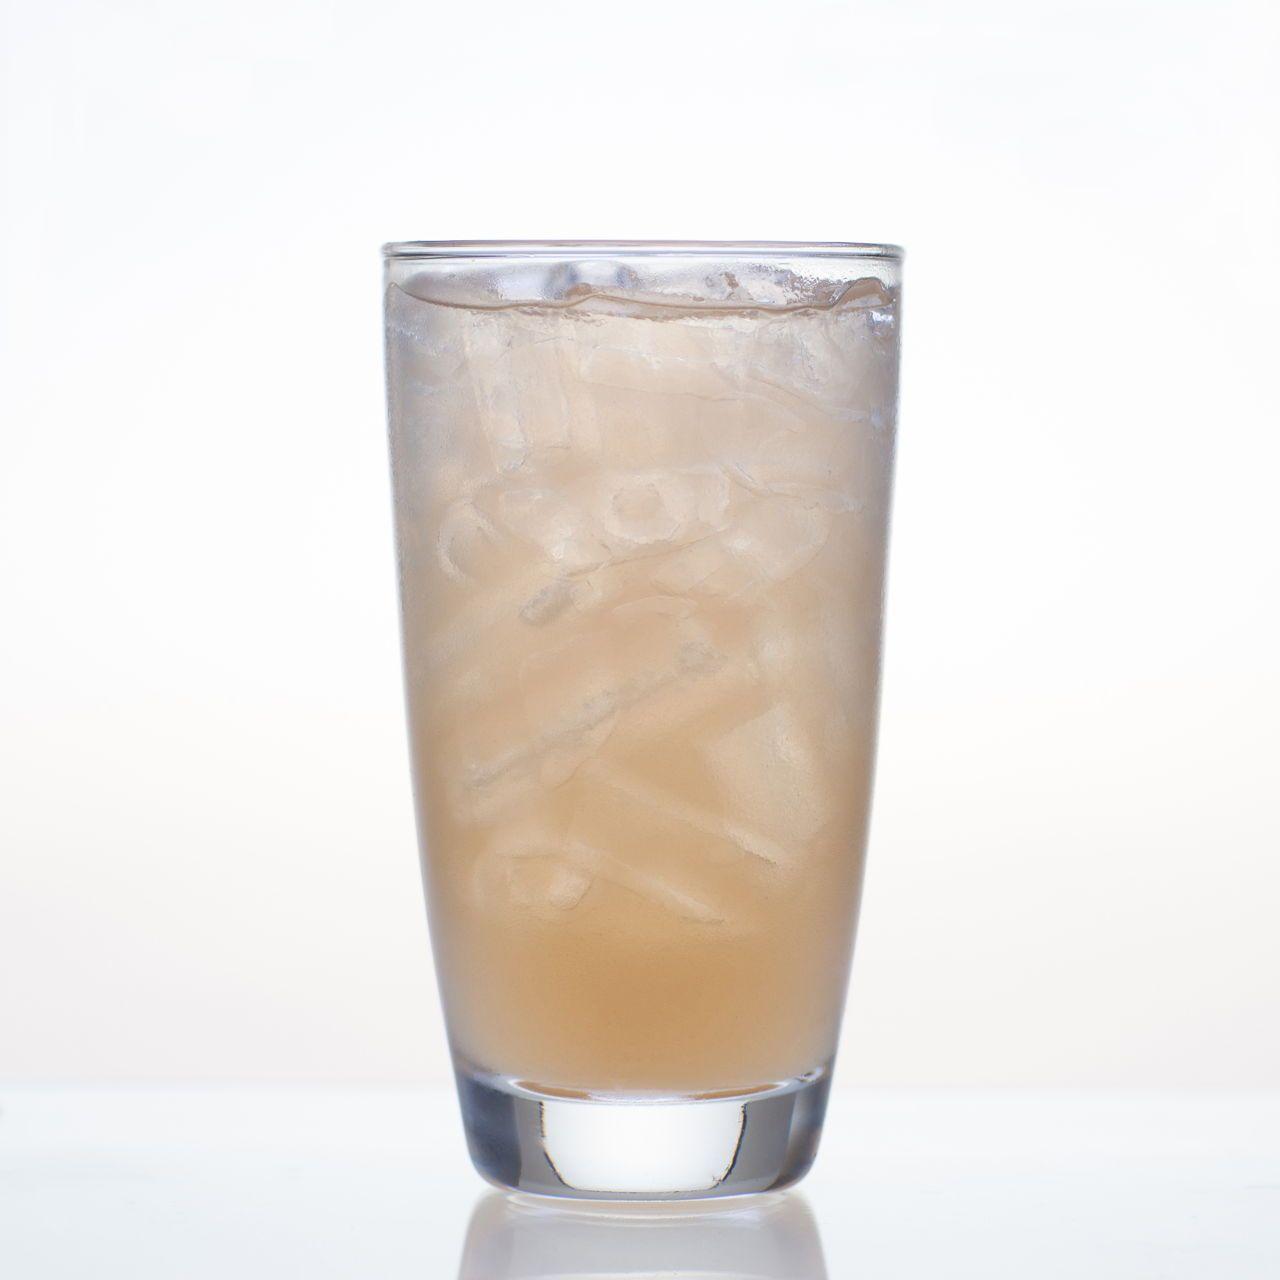 Fresh and cold tamarind juice tamarind juice tamarind